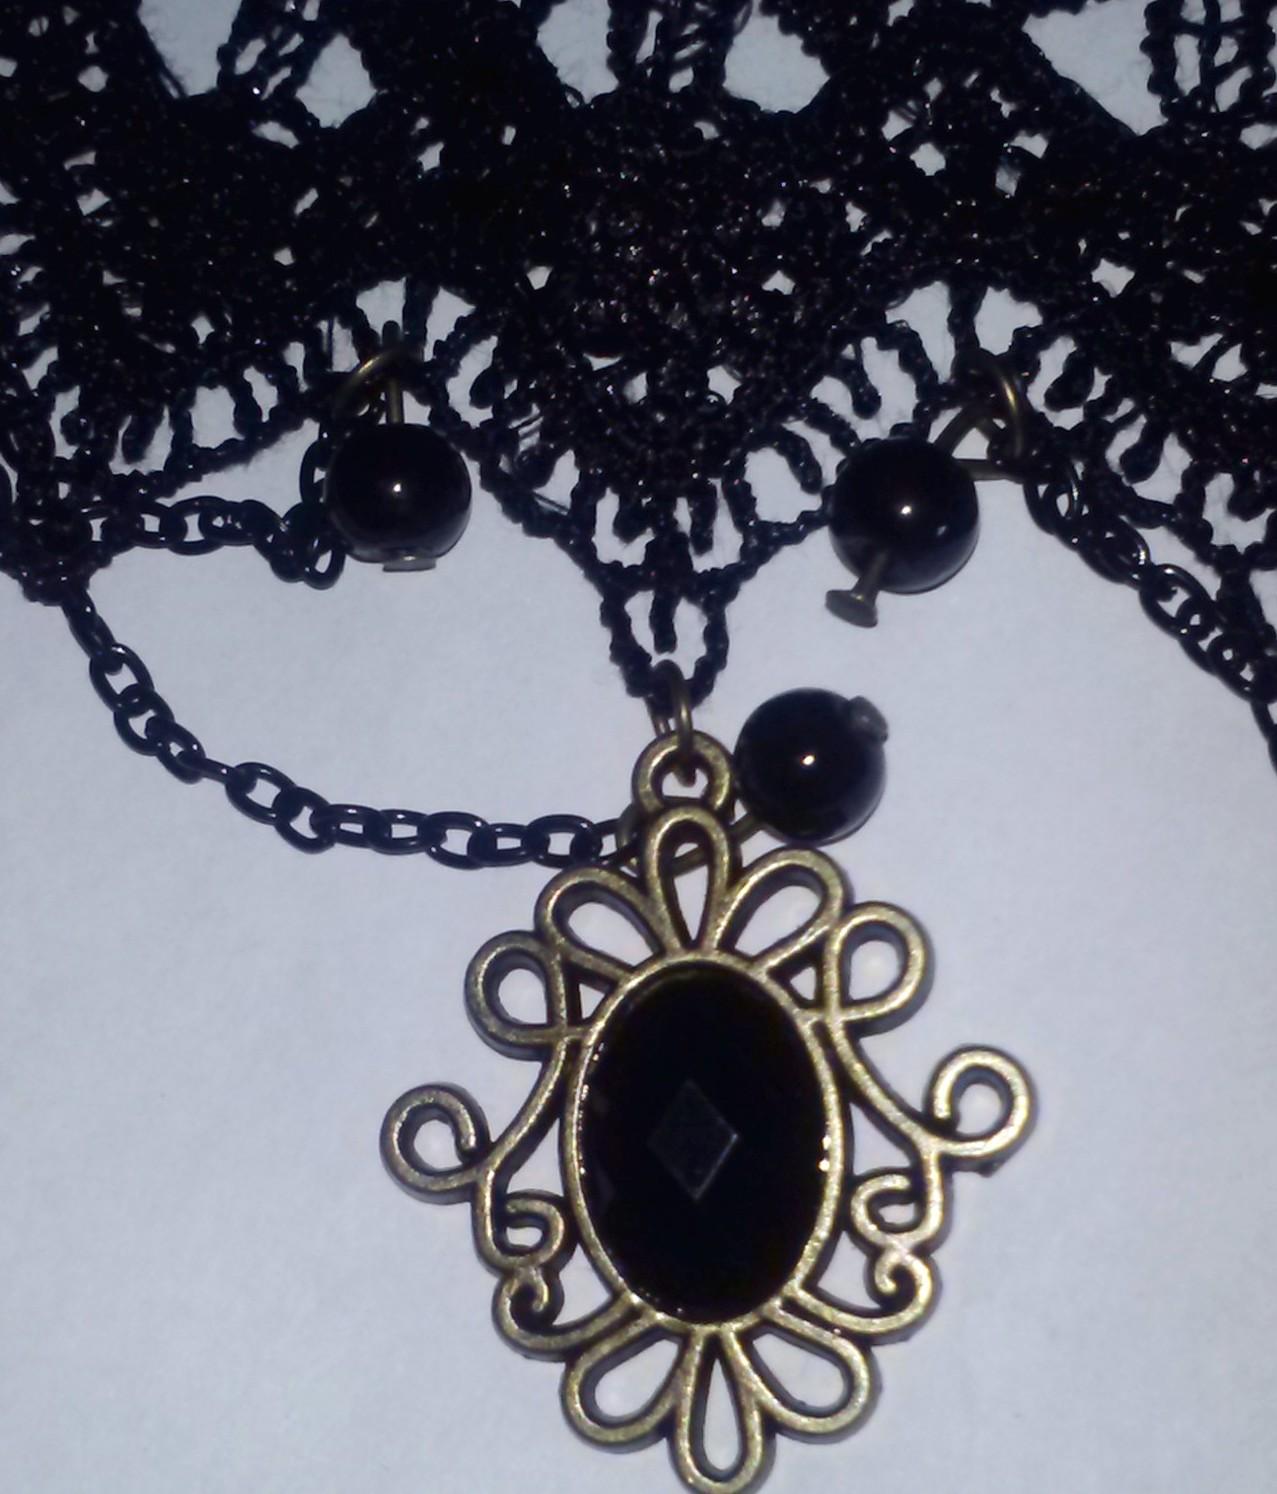 Black Victorian Gothic Lace Crochet Choker Collar necklace w/ ornate ...